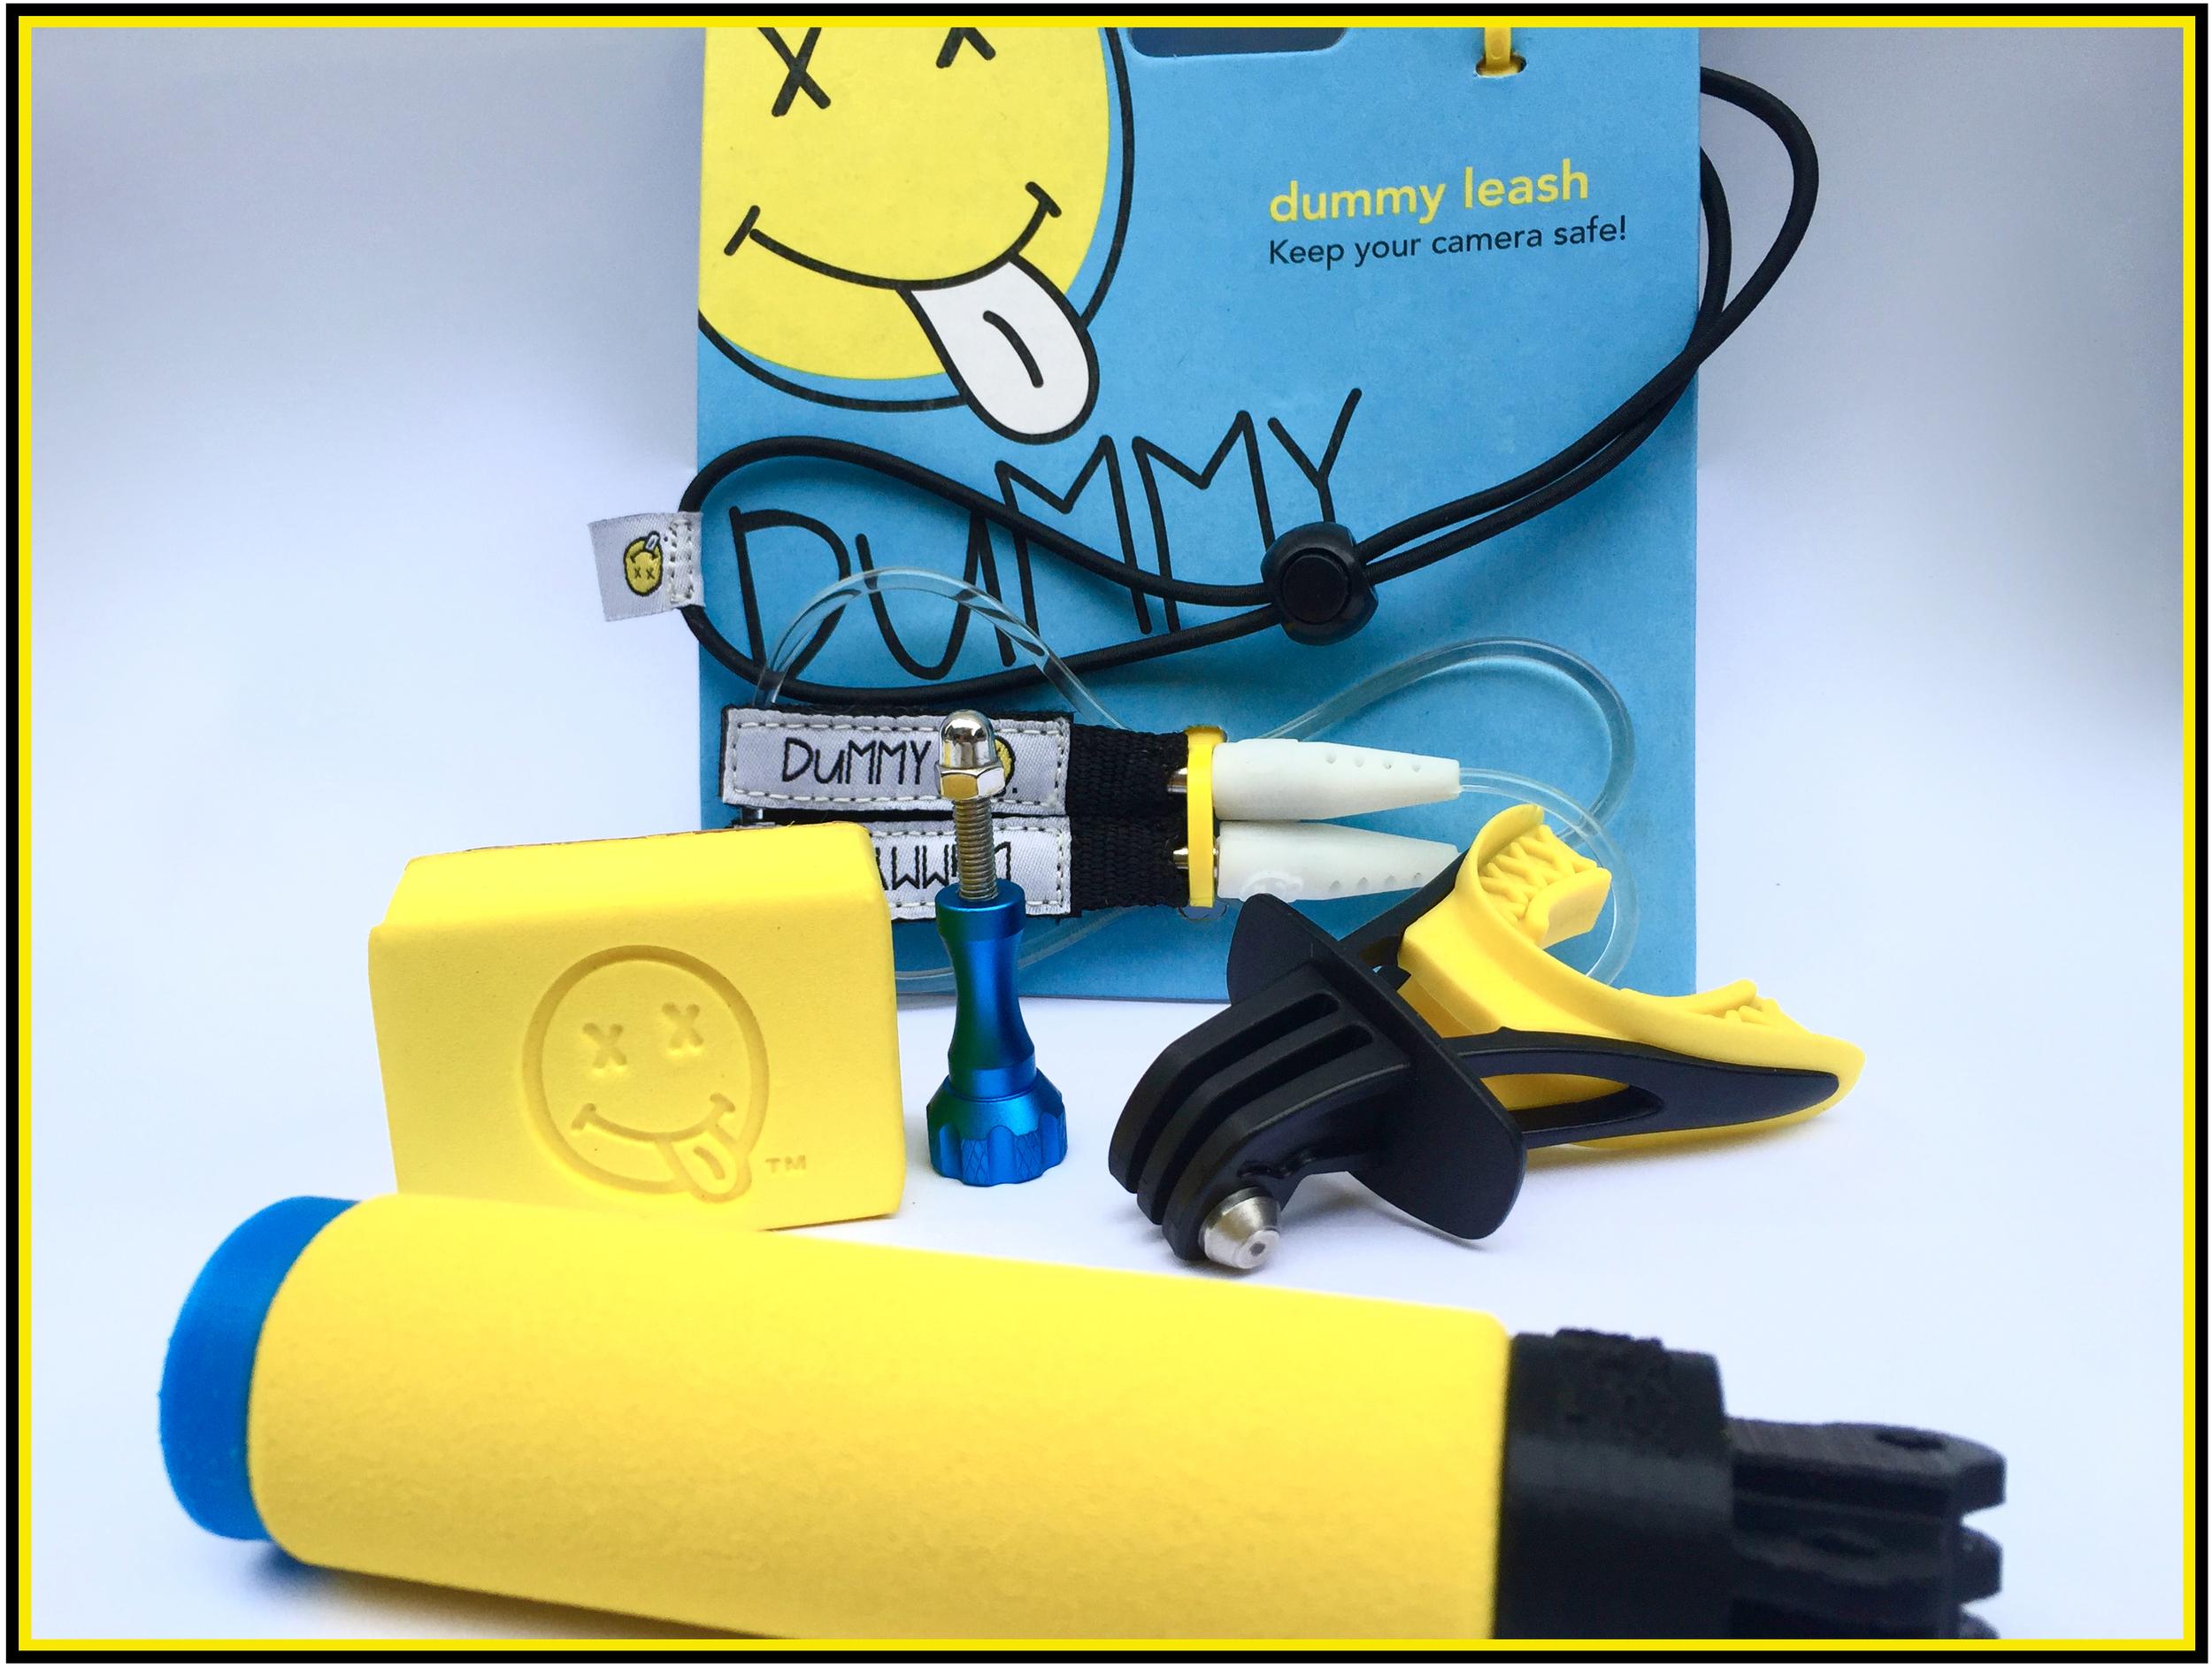 Dummy Mount 2 Bundle Kit.jpg